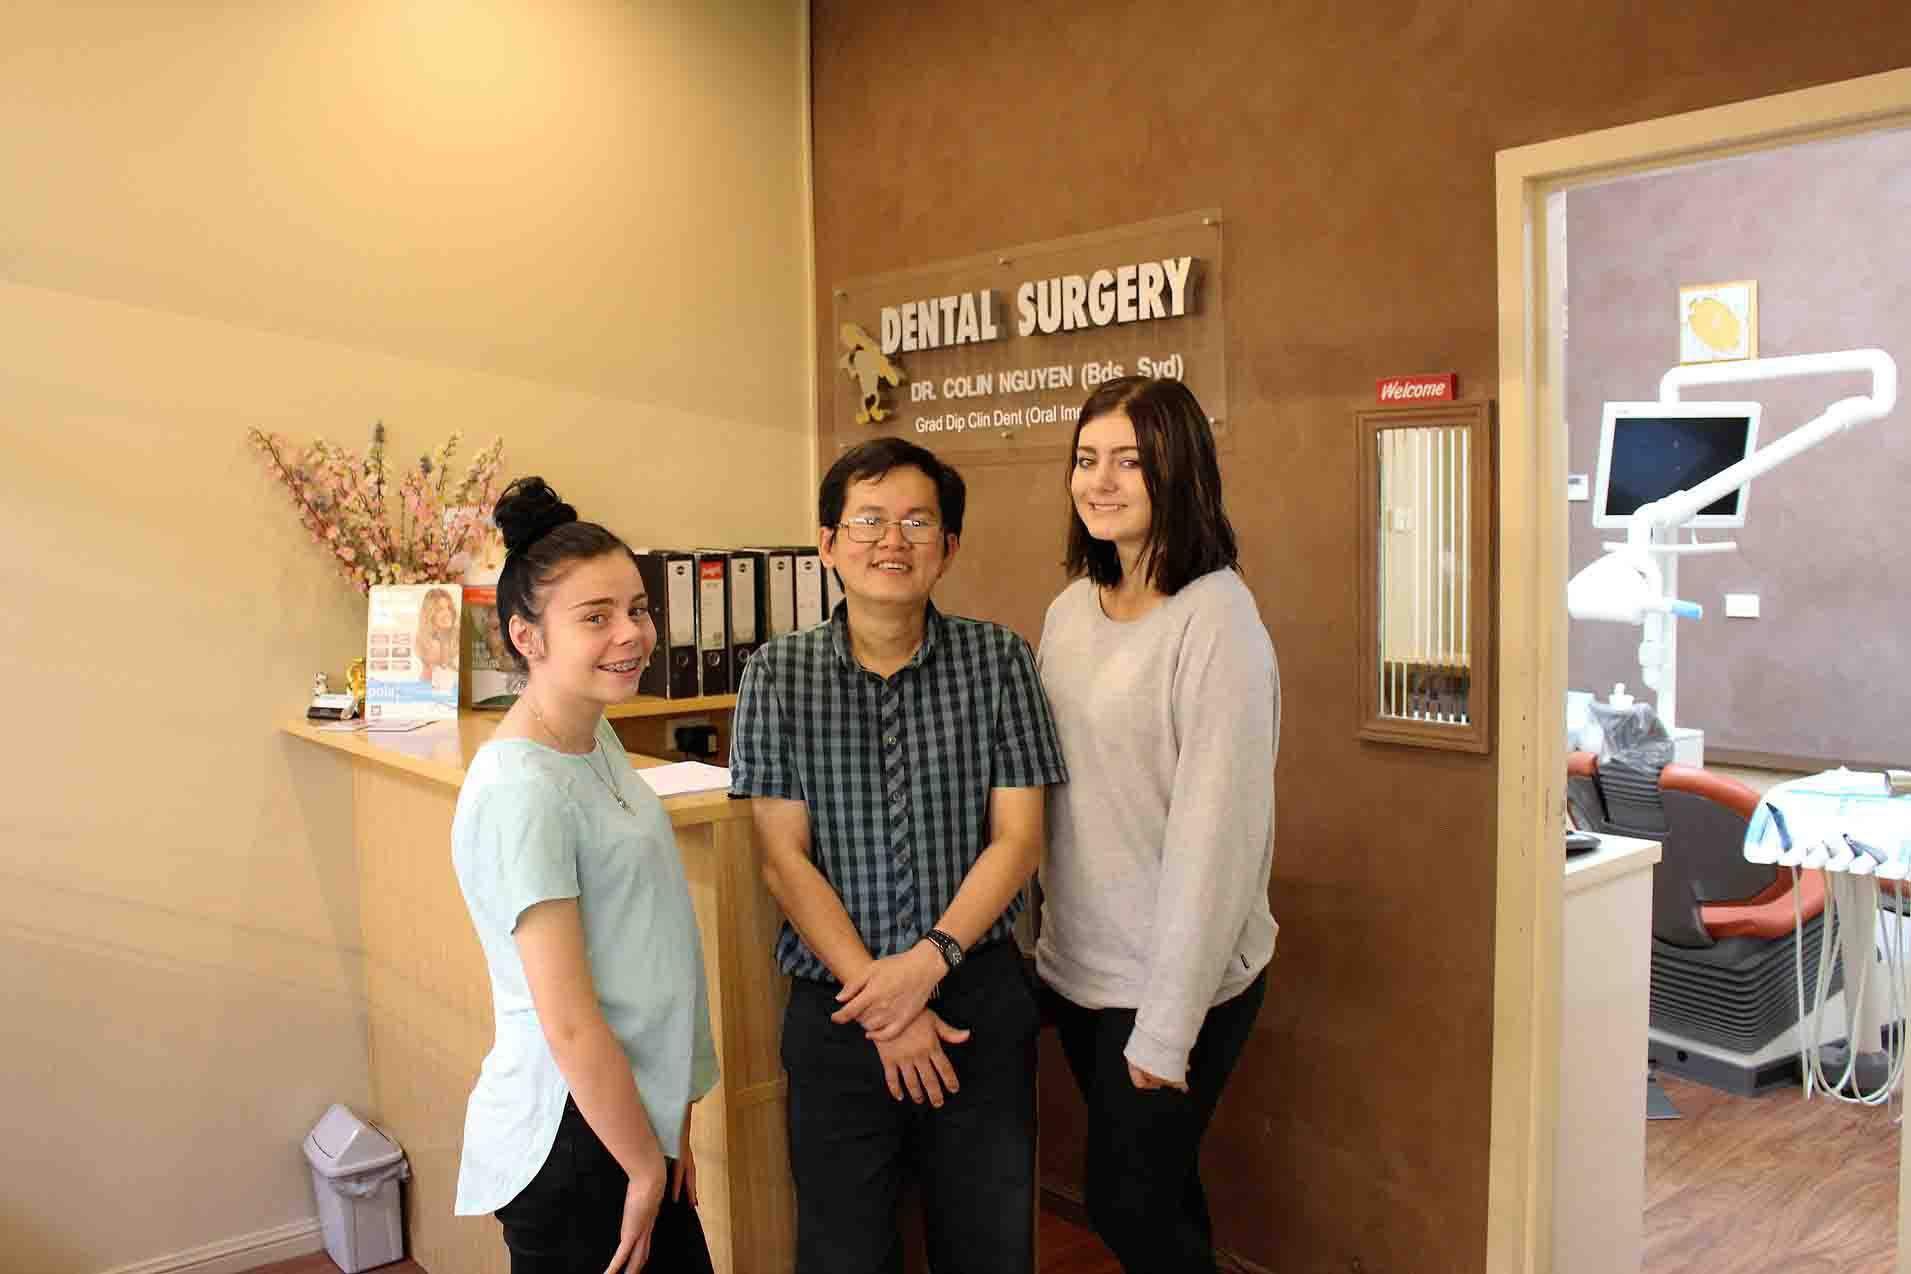 kellyville dental services employees